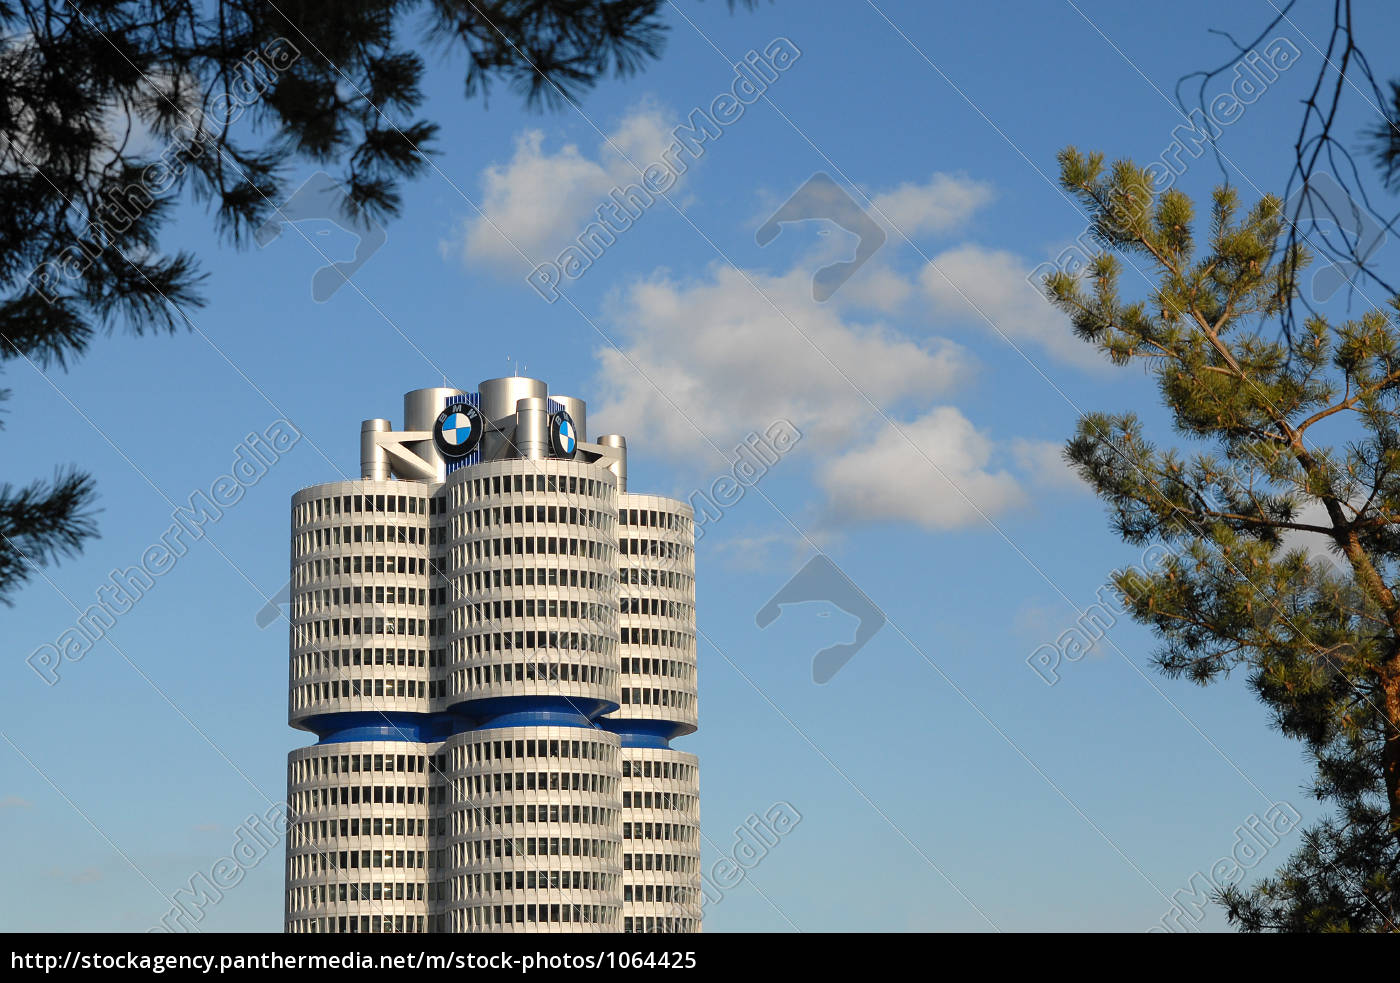 Beste Gebäude Rahmen Fotos - Benutzerdefinierte Bilderrahmen Ideen ...